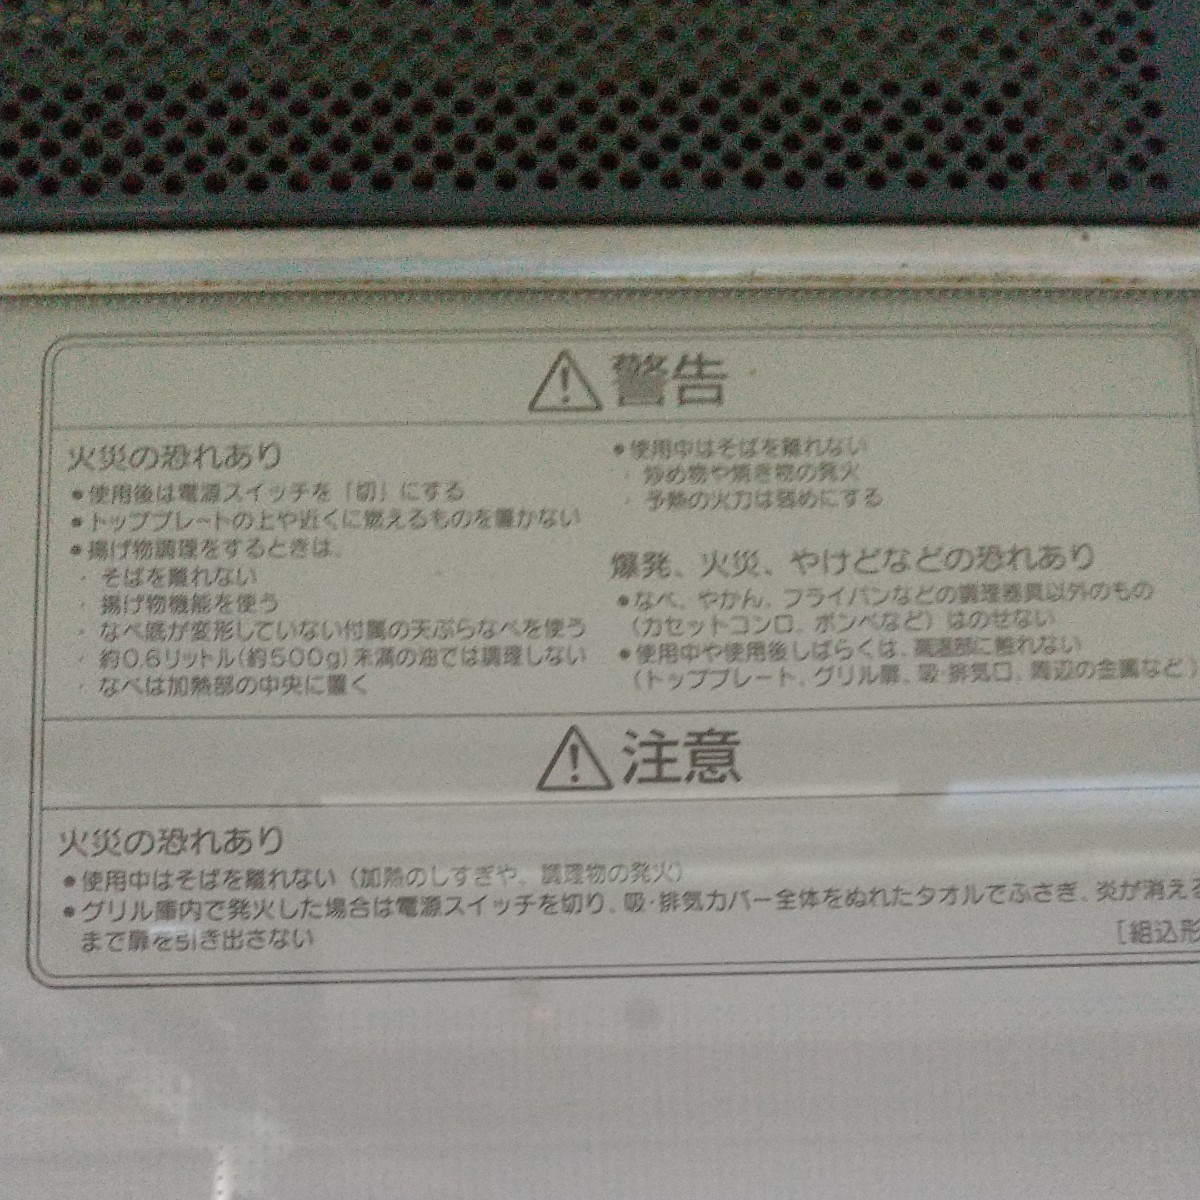 iHクッキングヒーター三菱電気製送料込み専用にて他の方お控え下さい。